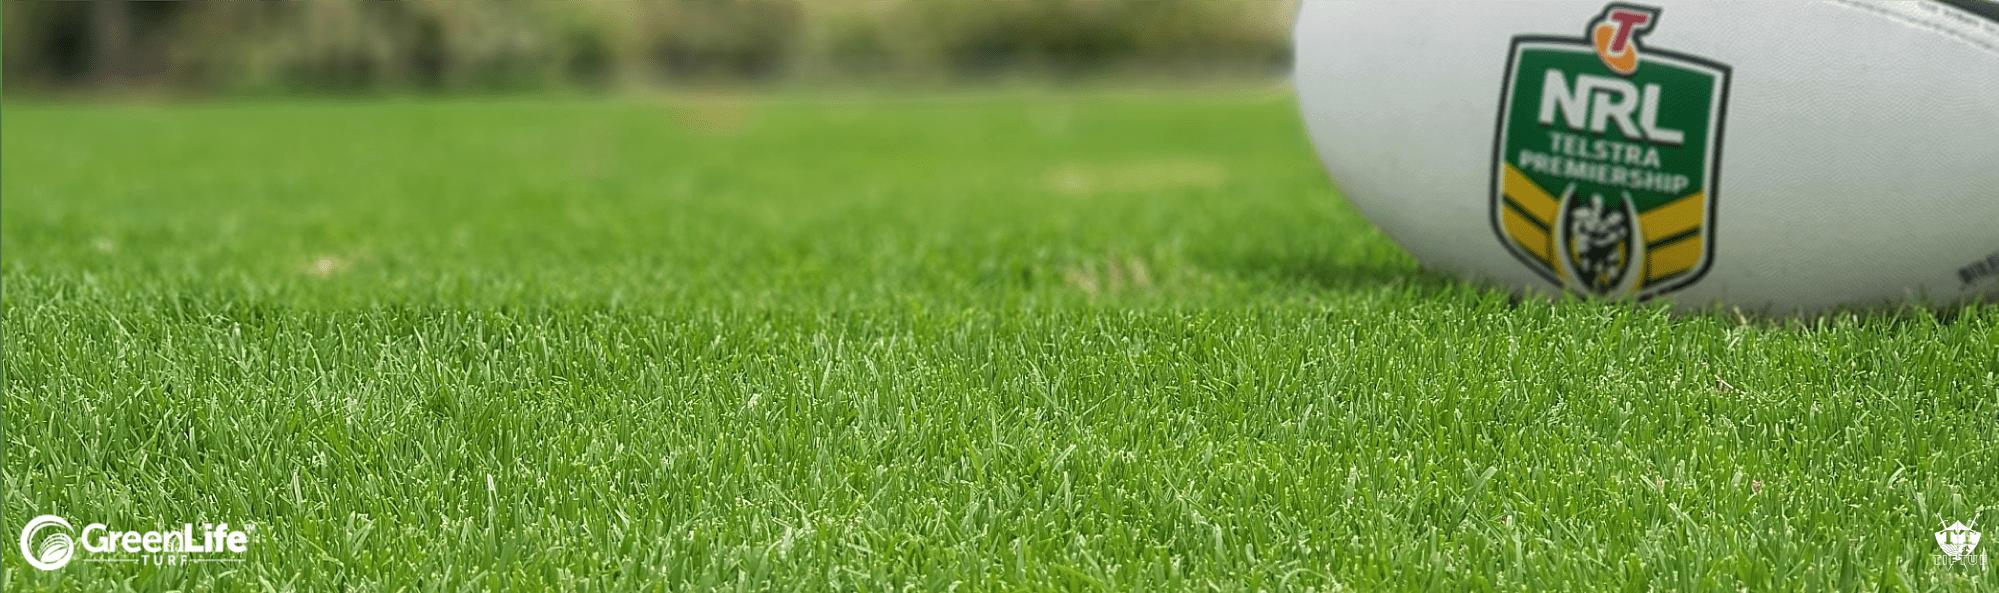 TifTuf Bermuda Grass - the hybrid Bermuda